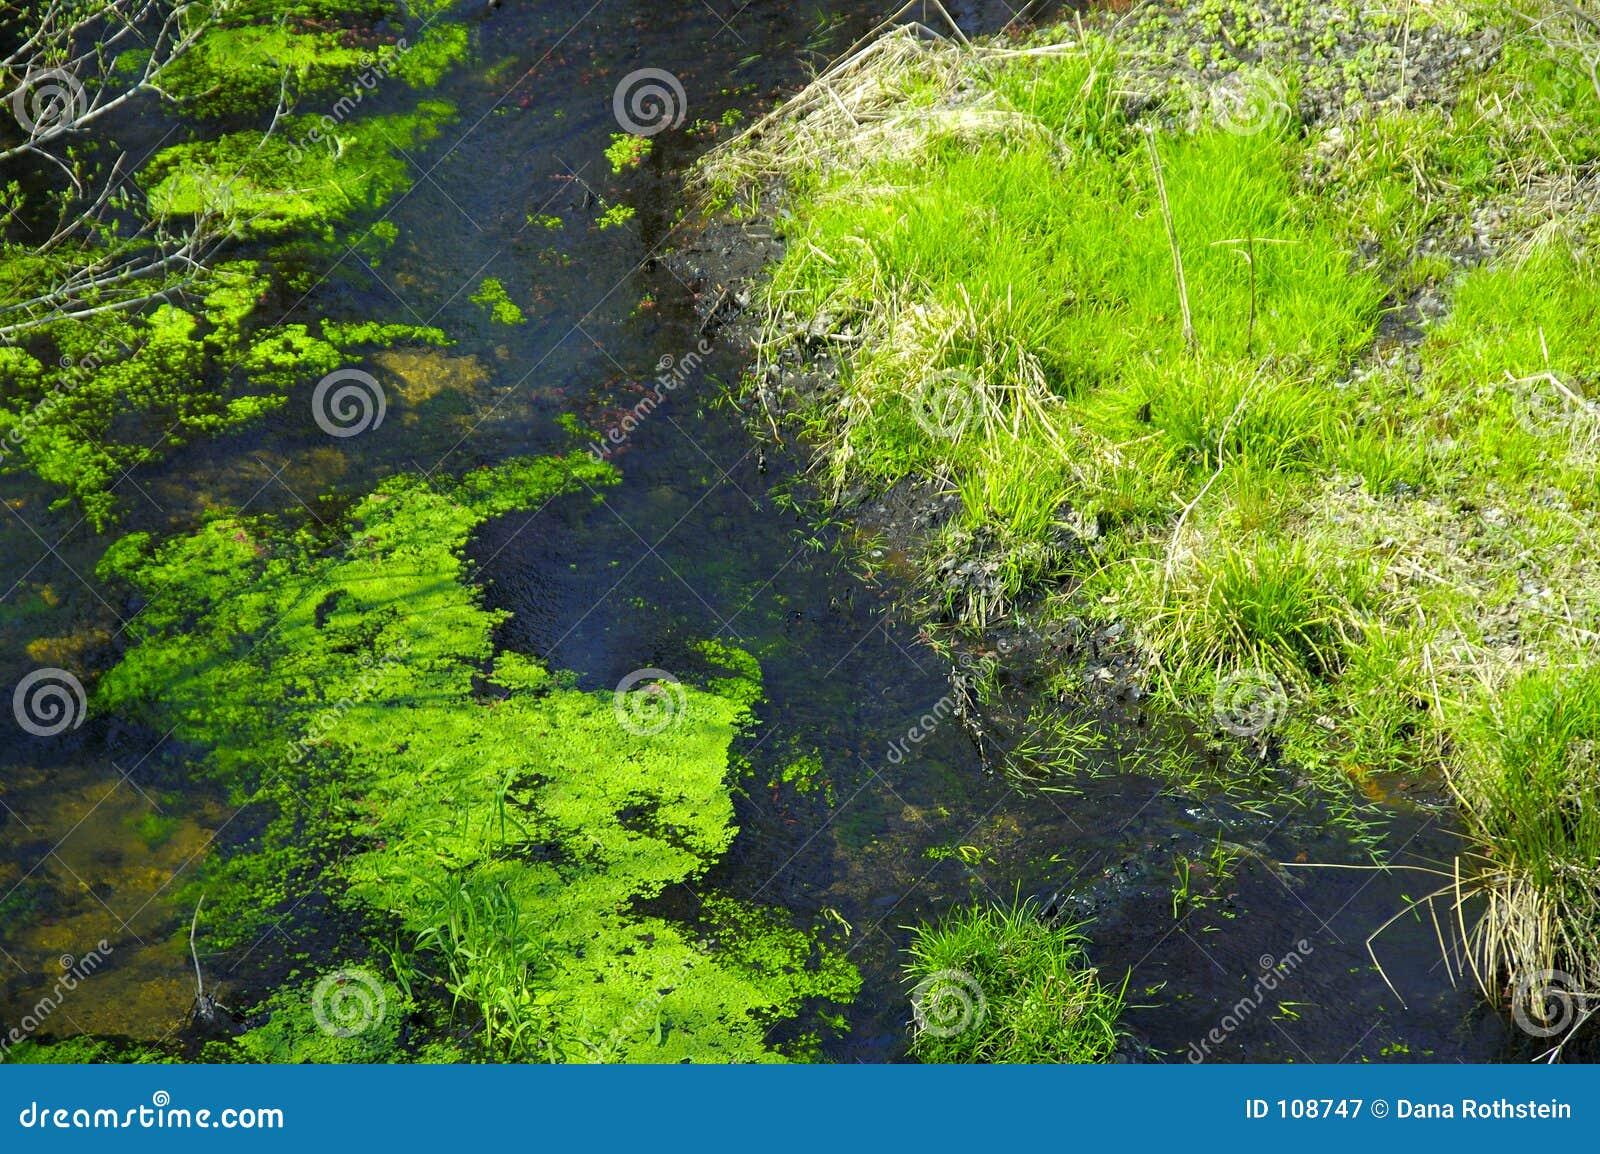 Stagnant Creek